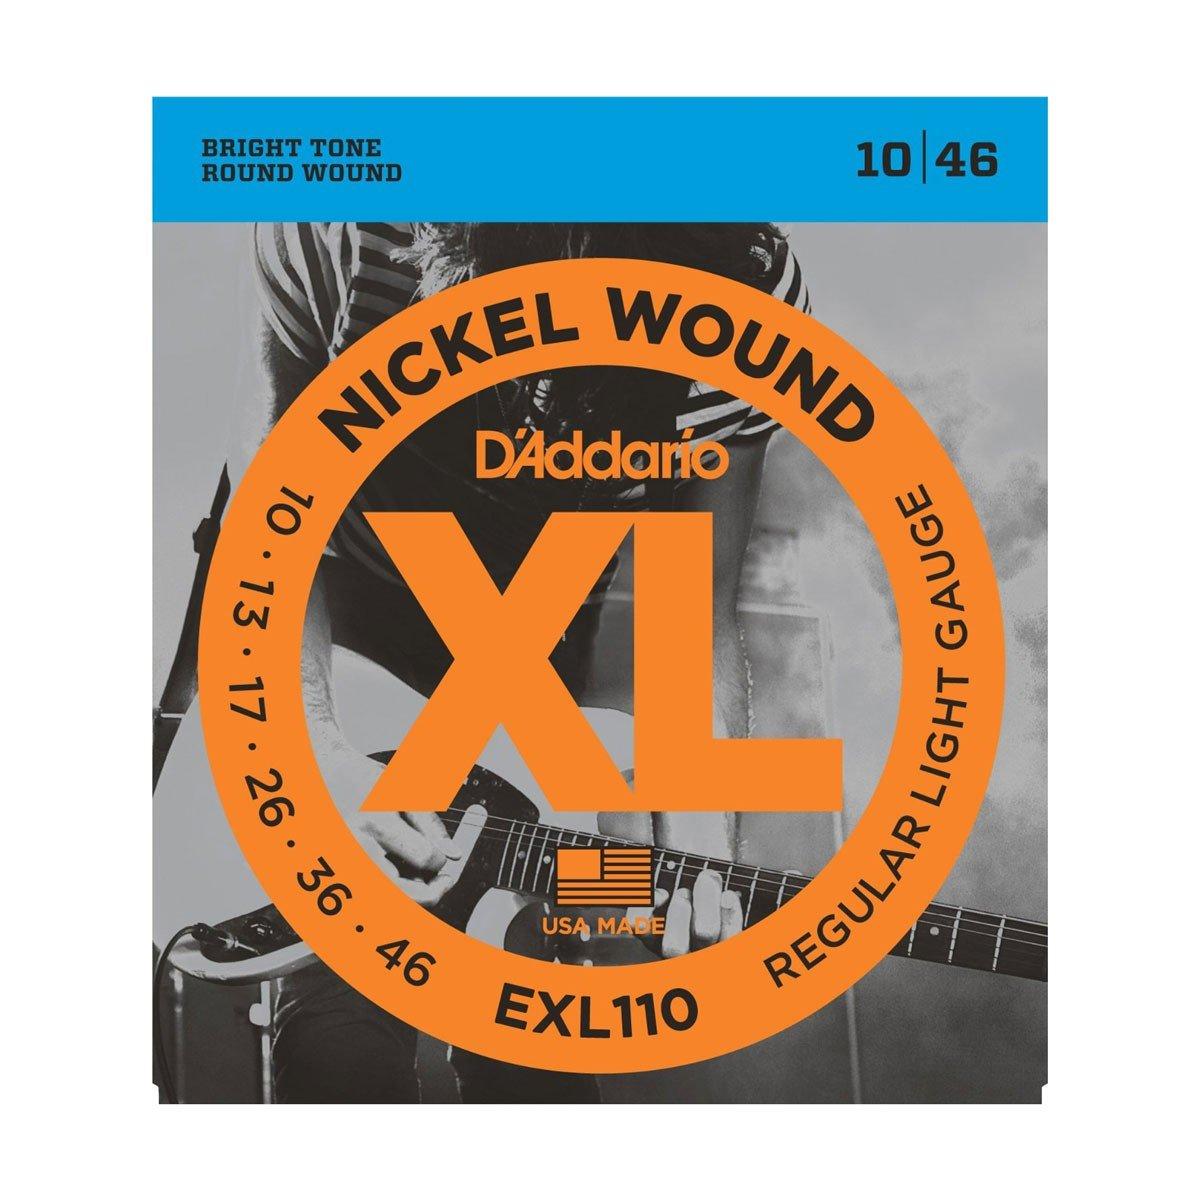 DAddario EXL110 Light Gauge Nickel Wound Electric Guitar Strings